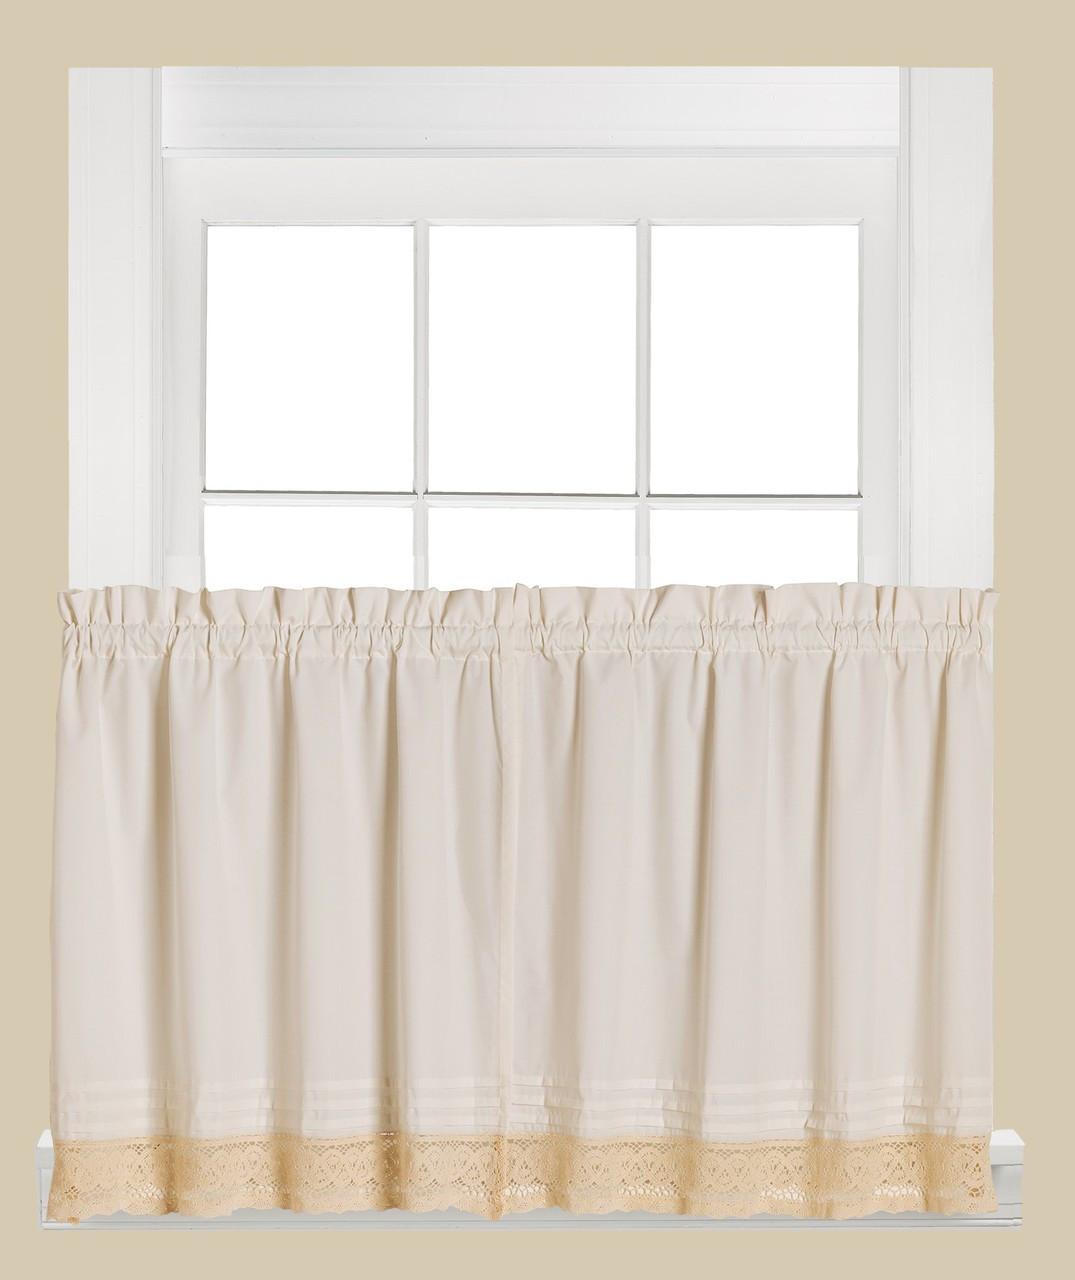 Heritage Lace 36 Kitchen Curtain Tier